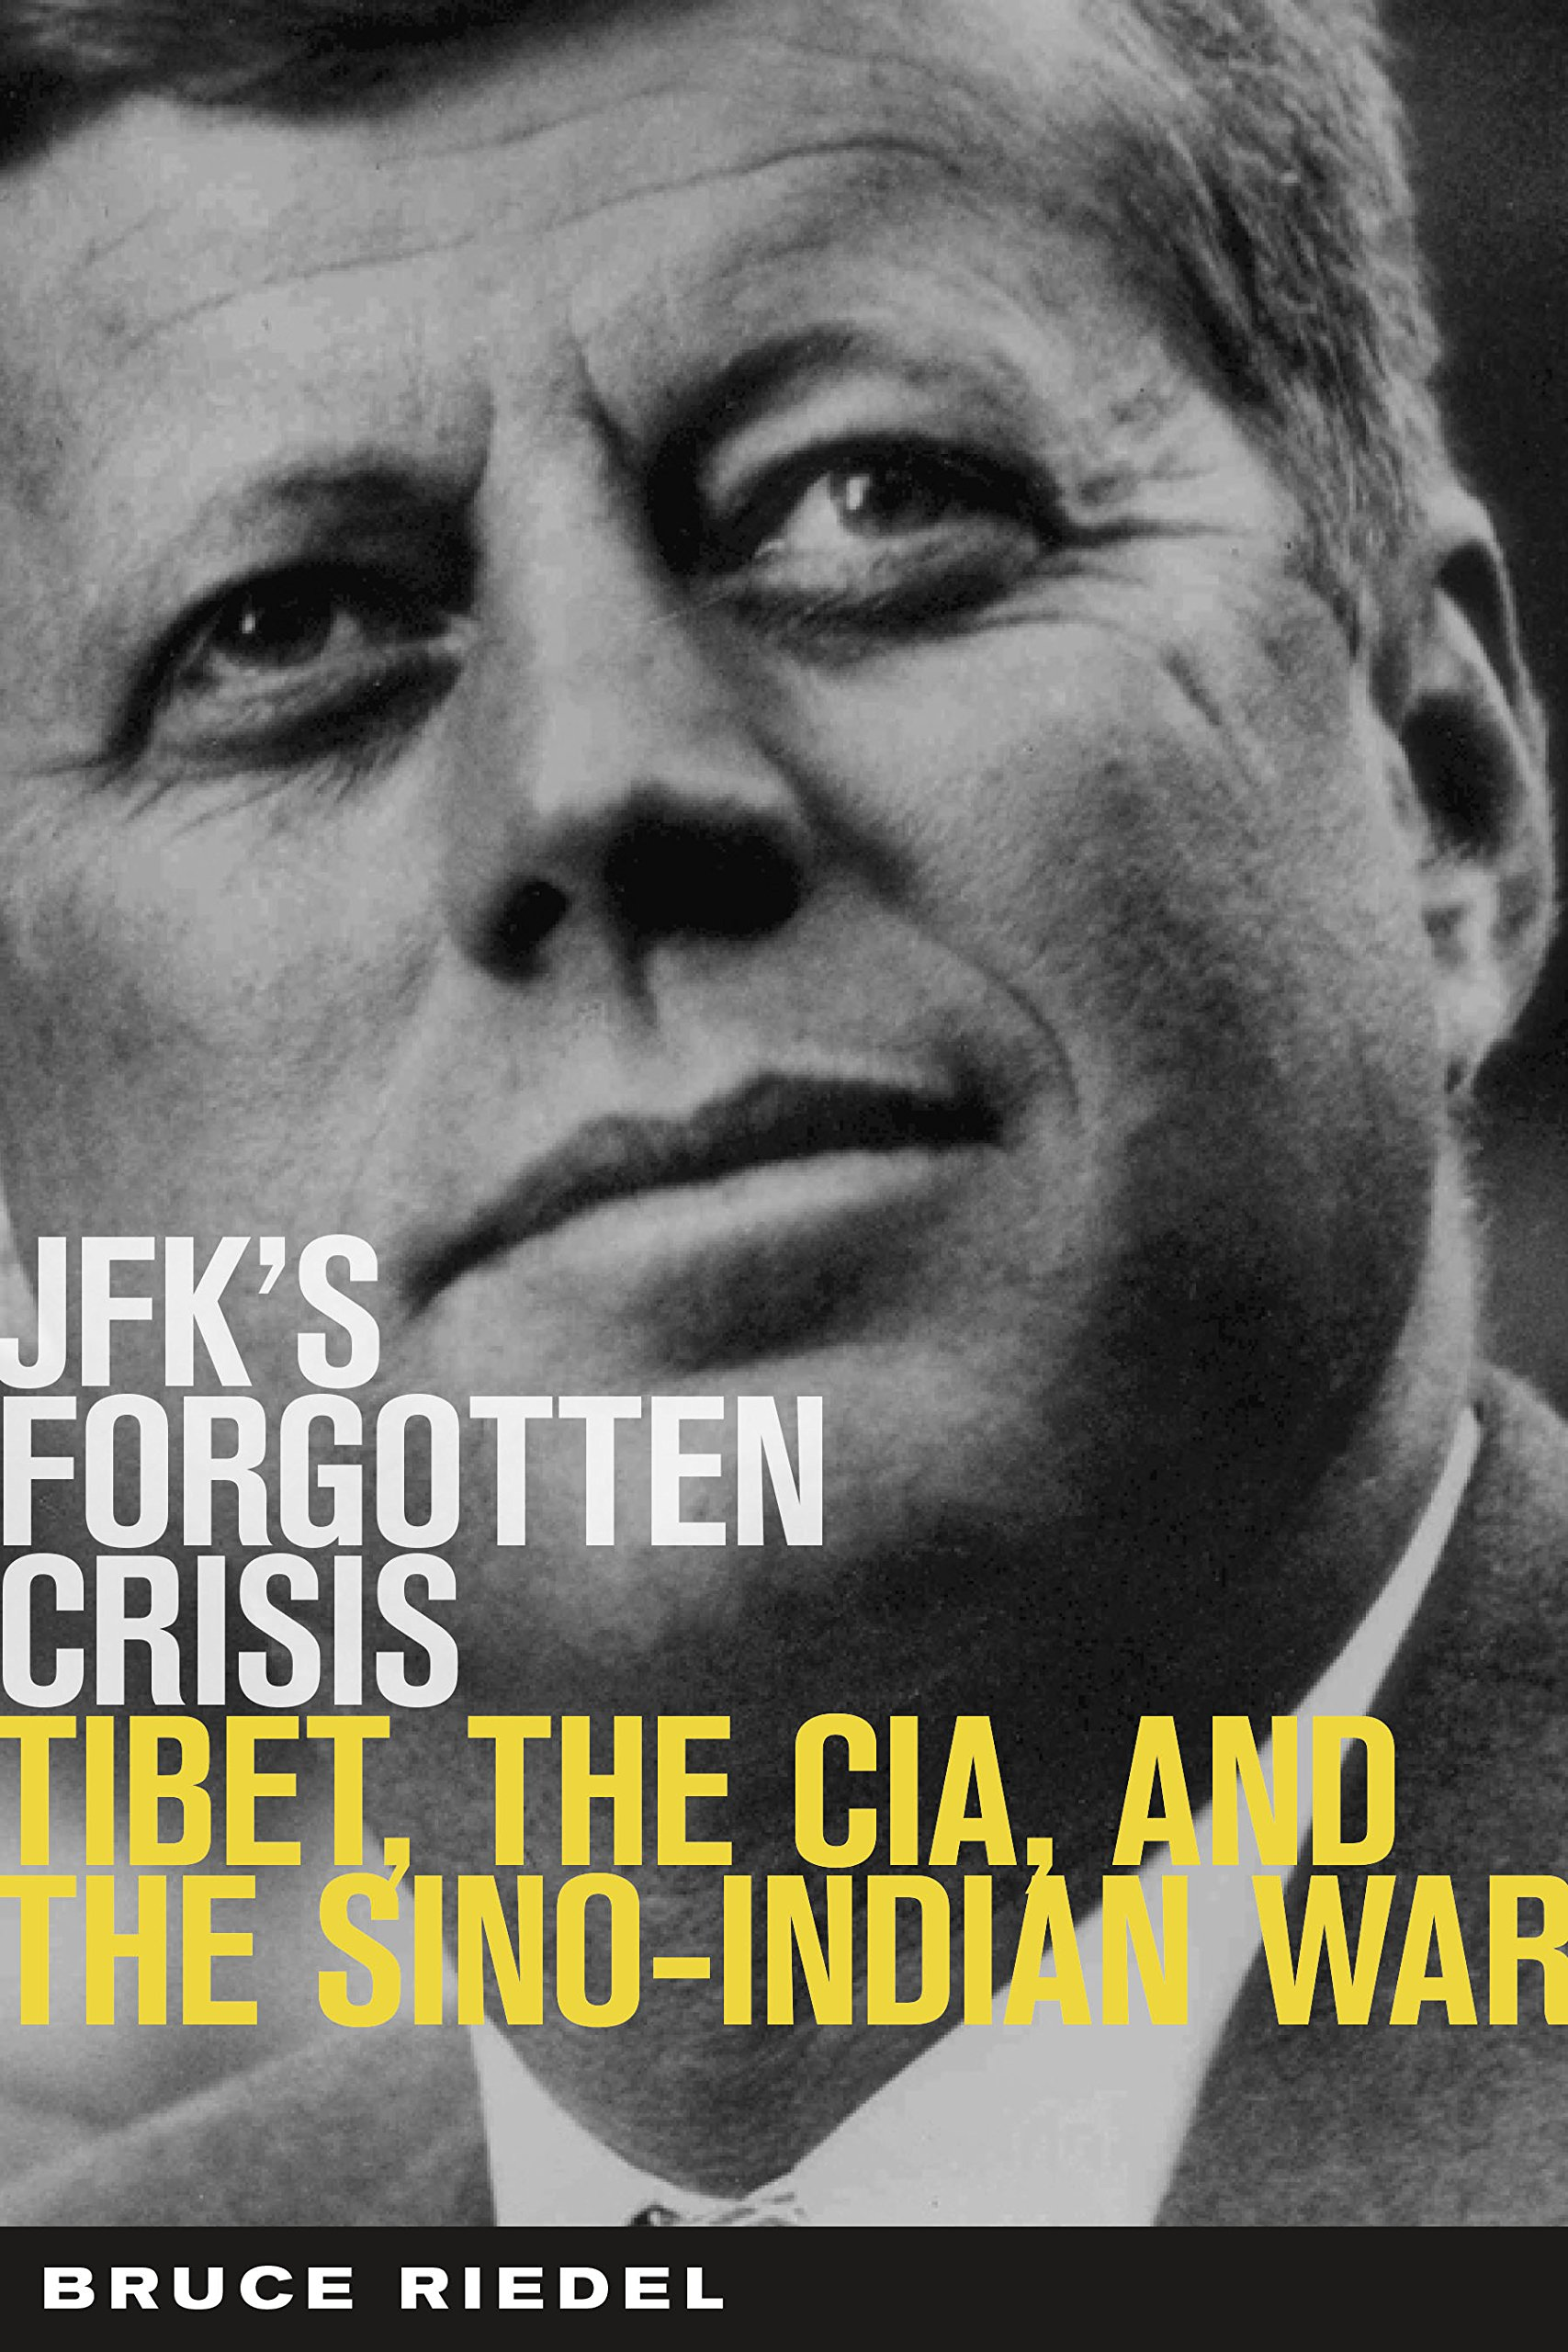 JFK's Forgotten Crisis  Tibet The CIA And Sino Indian War